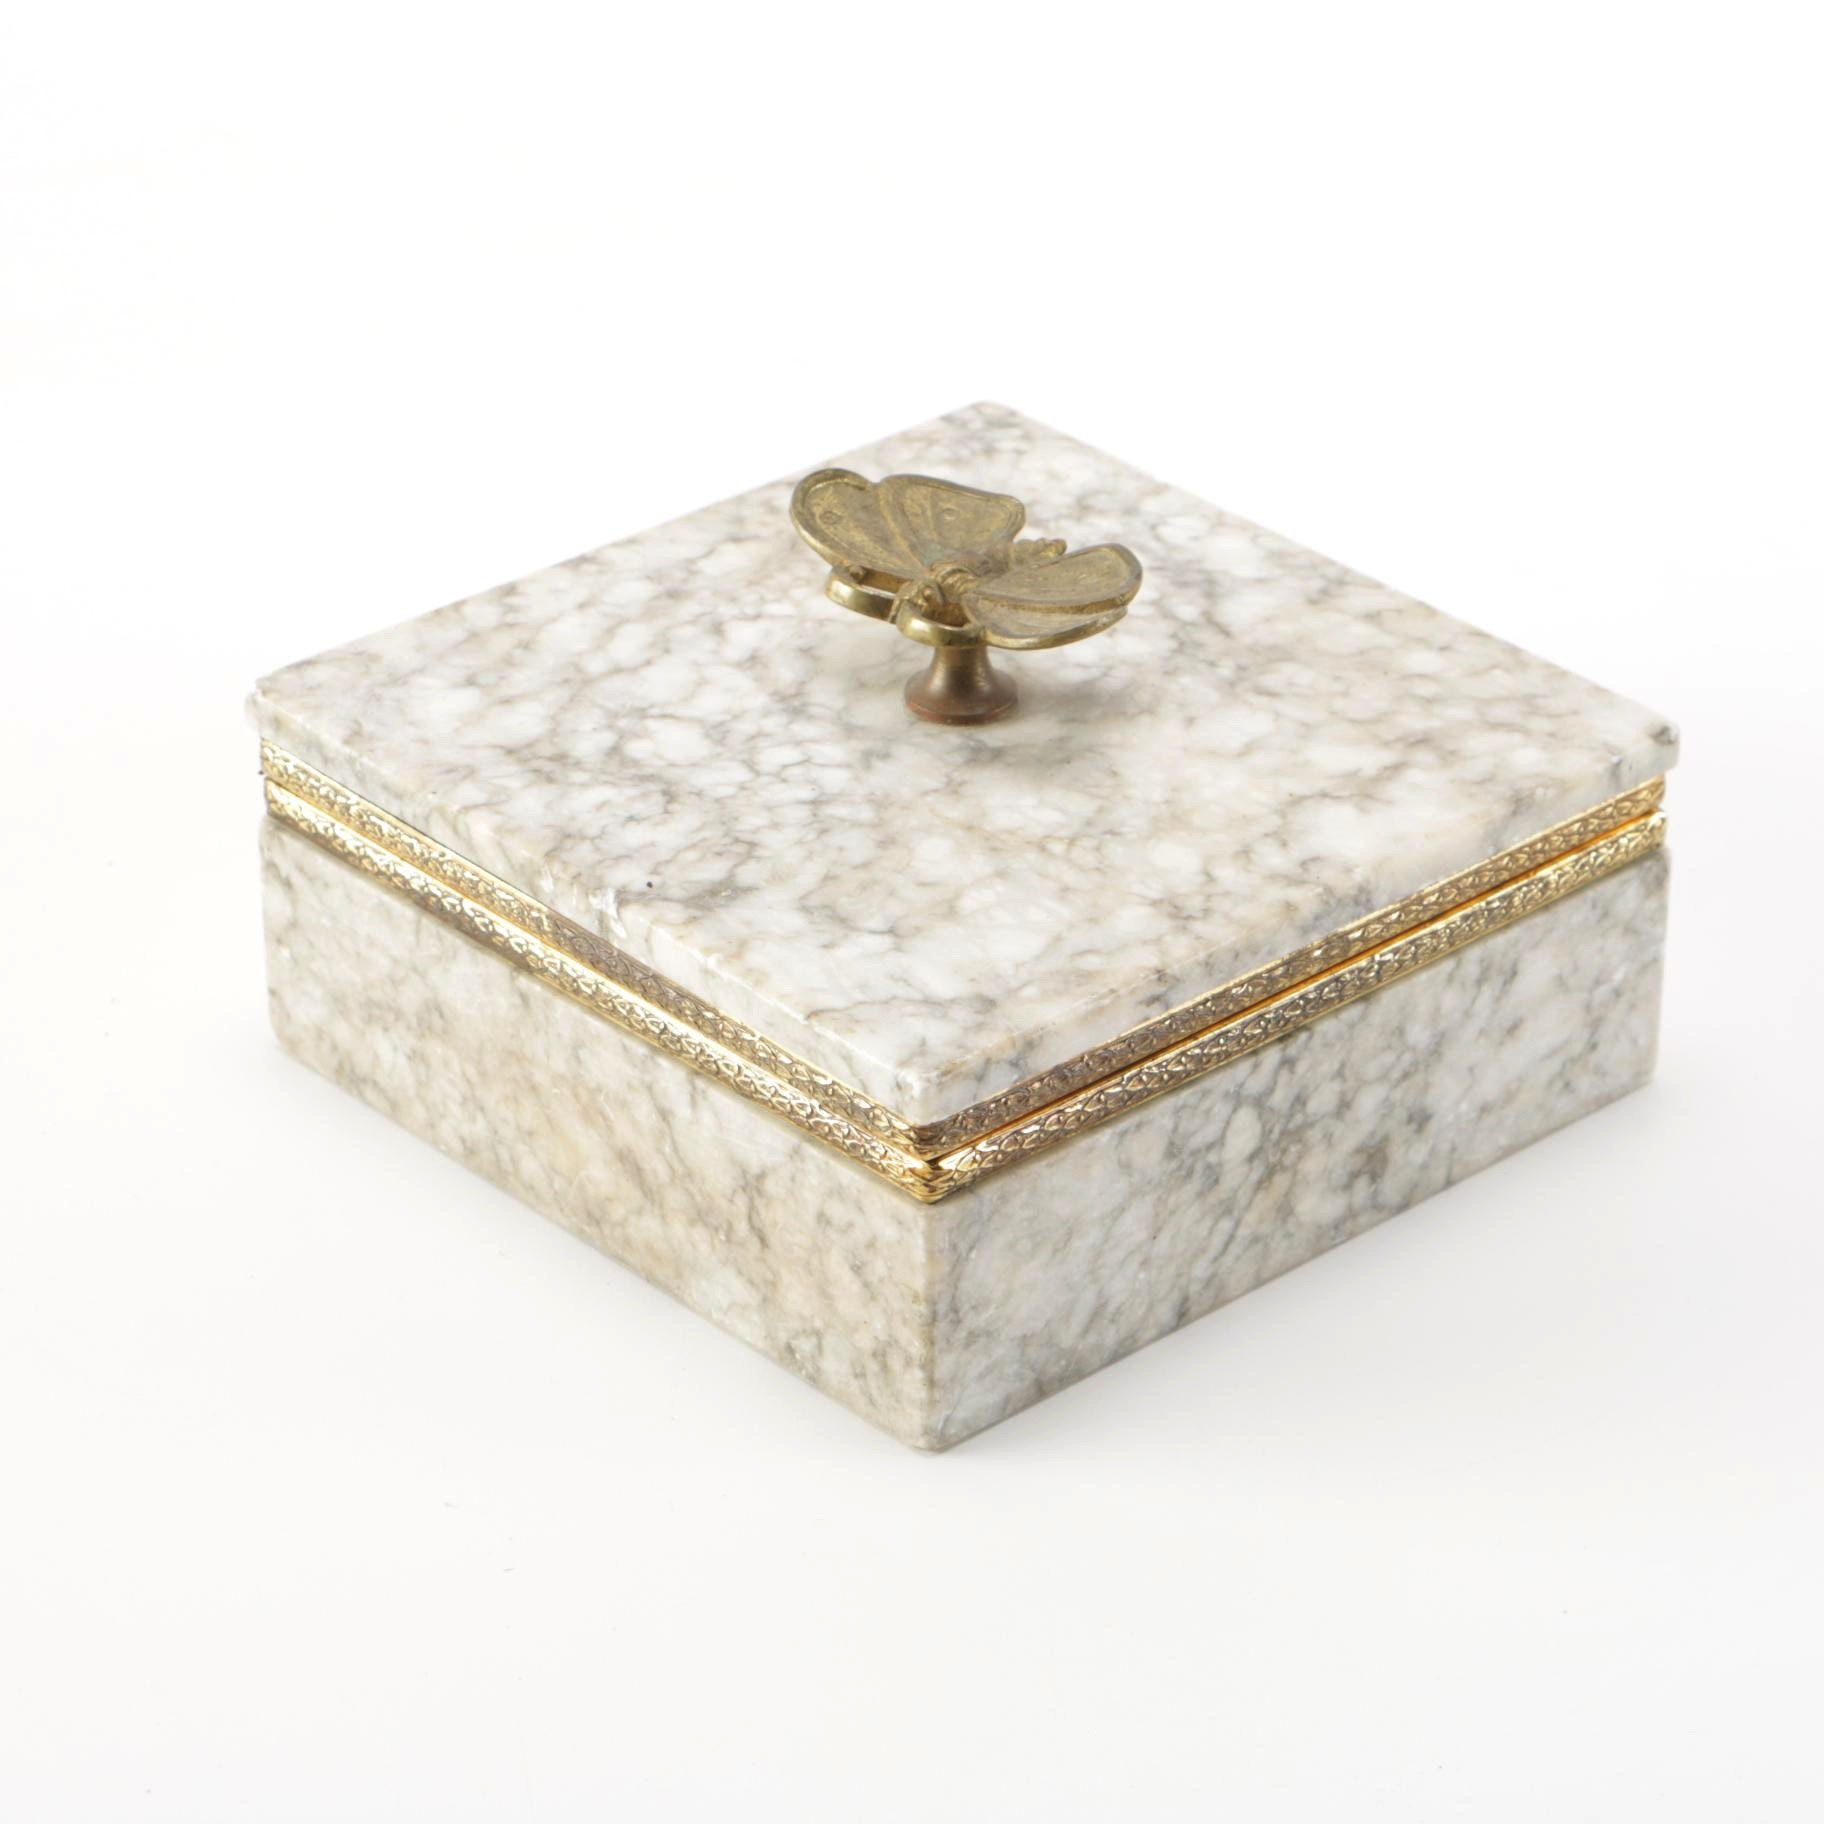 Alabaster and Brass Dragonfly Trinket Box